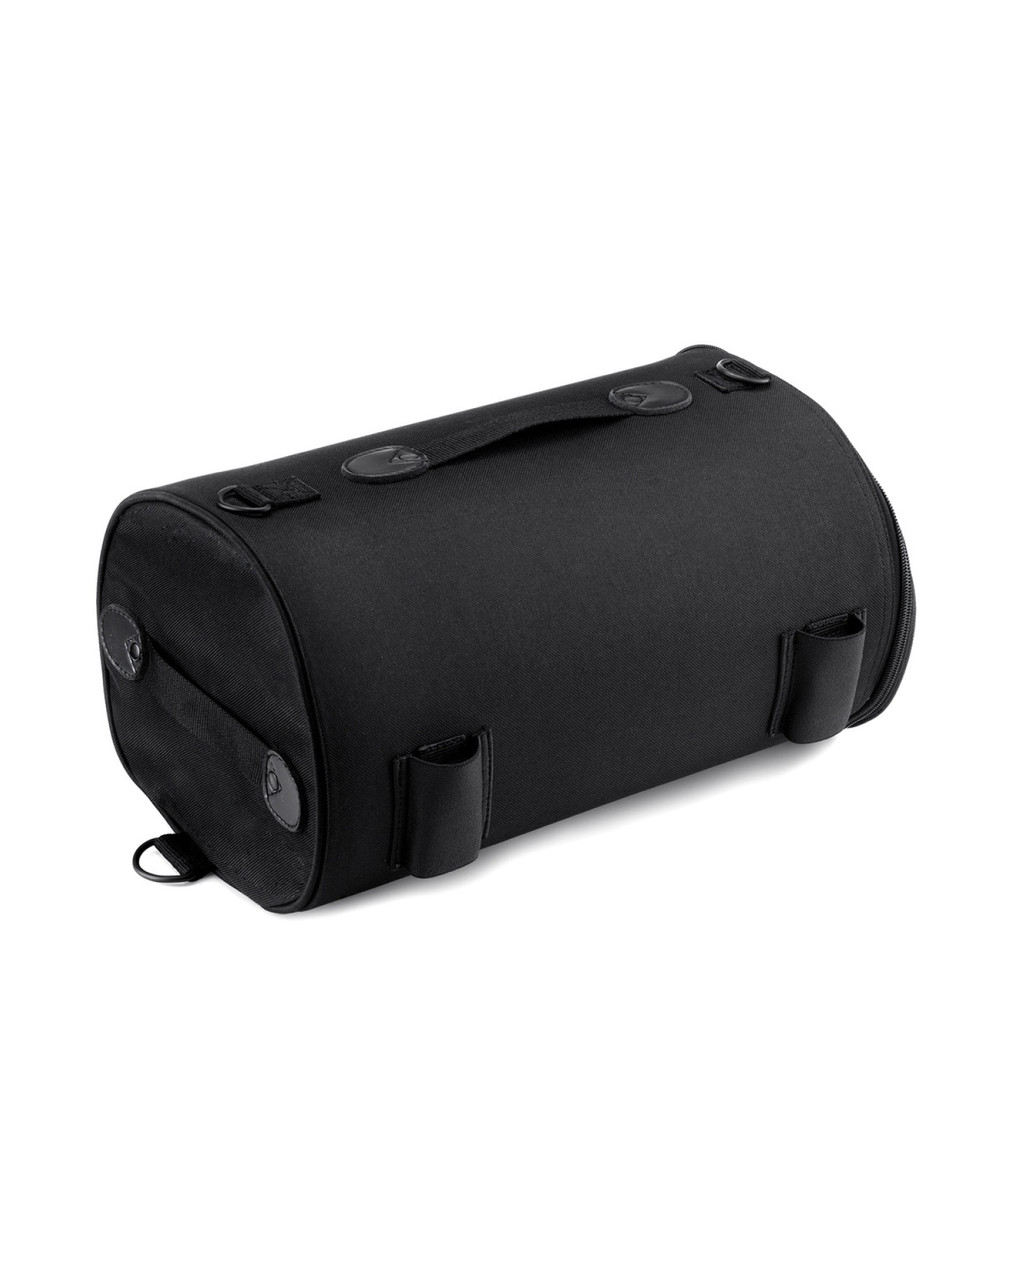 Honda Viking Extra Large Plain Motorcycle Tail Bag Roll Bag